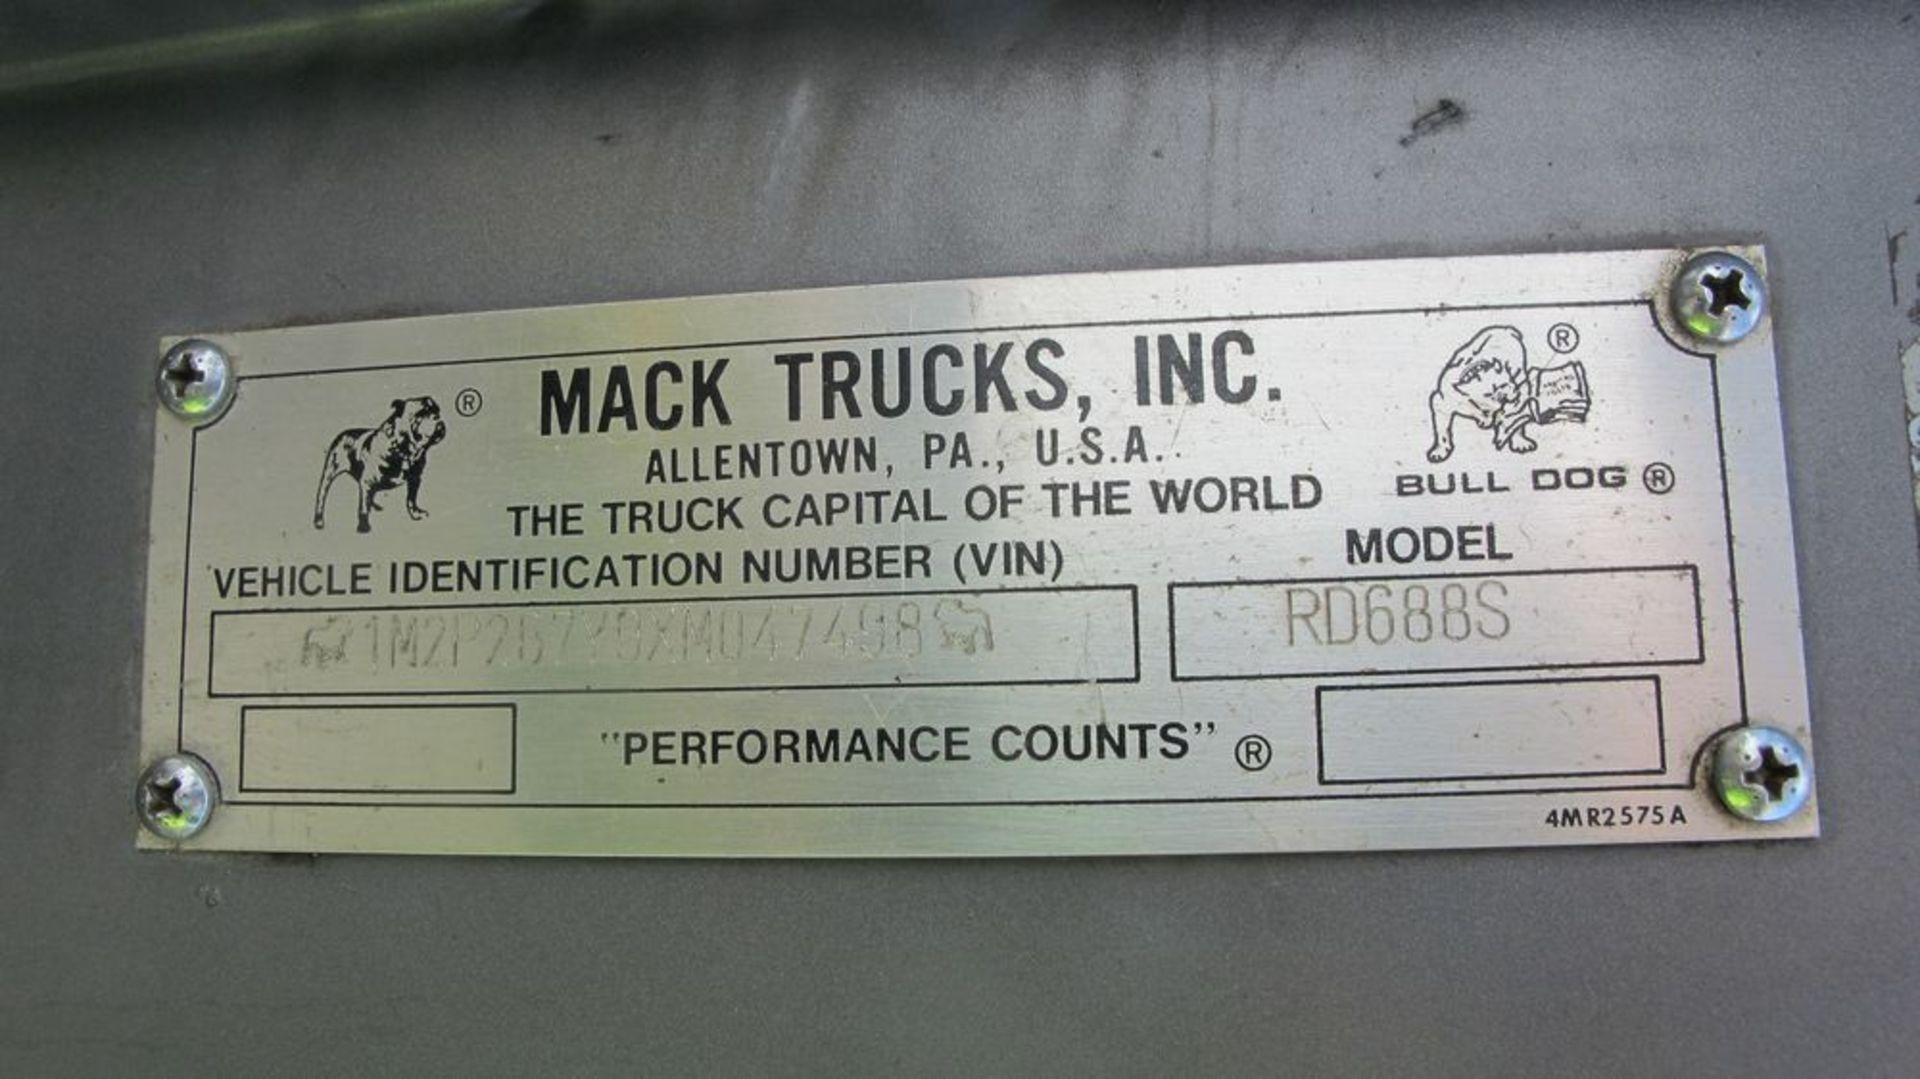 Lot 12 - MACK TRACTOR (GREY), RD6885 YARD TRUCK, VIN #1M2P267Y9XMO47498 (RUNNING) (WAREHOUSE 30 - PARKING